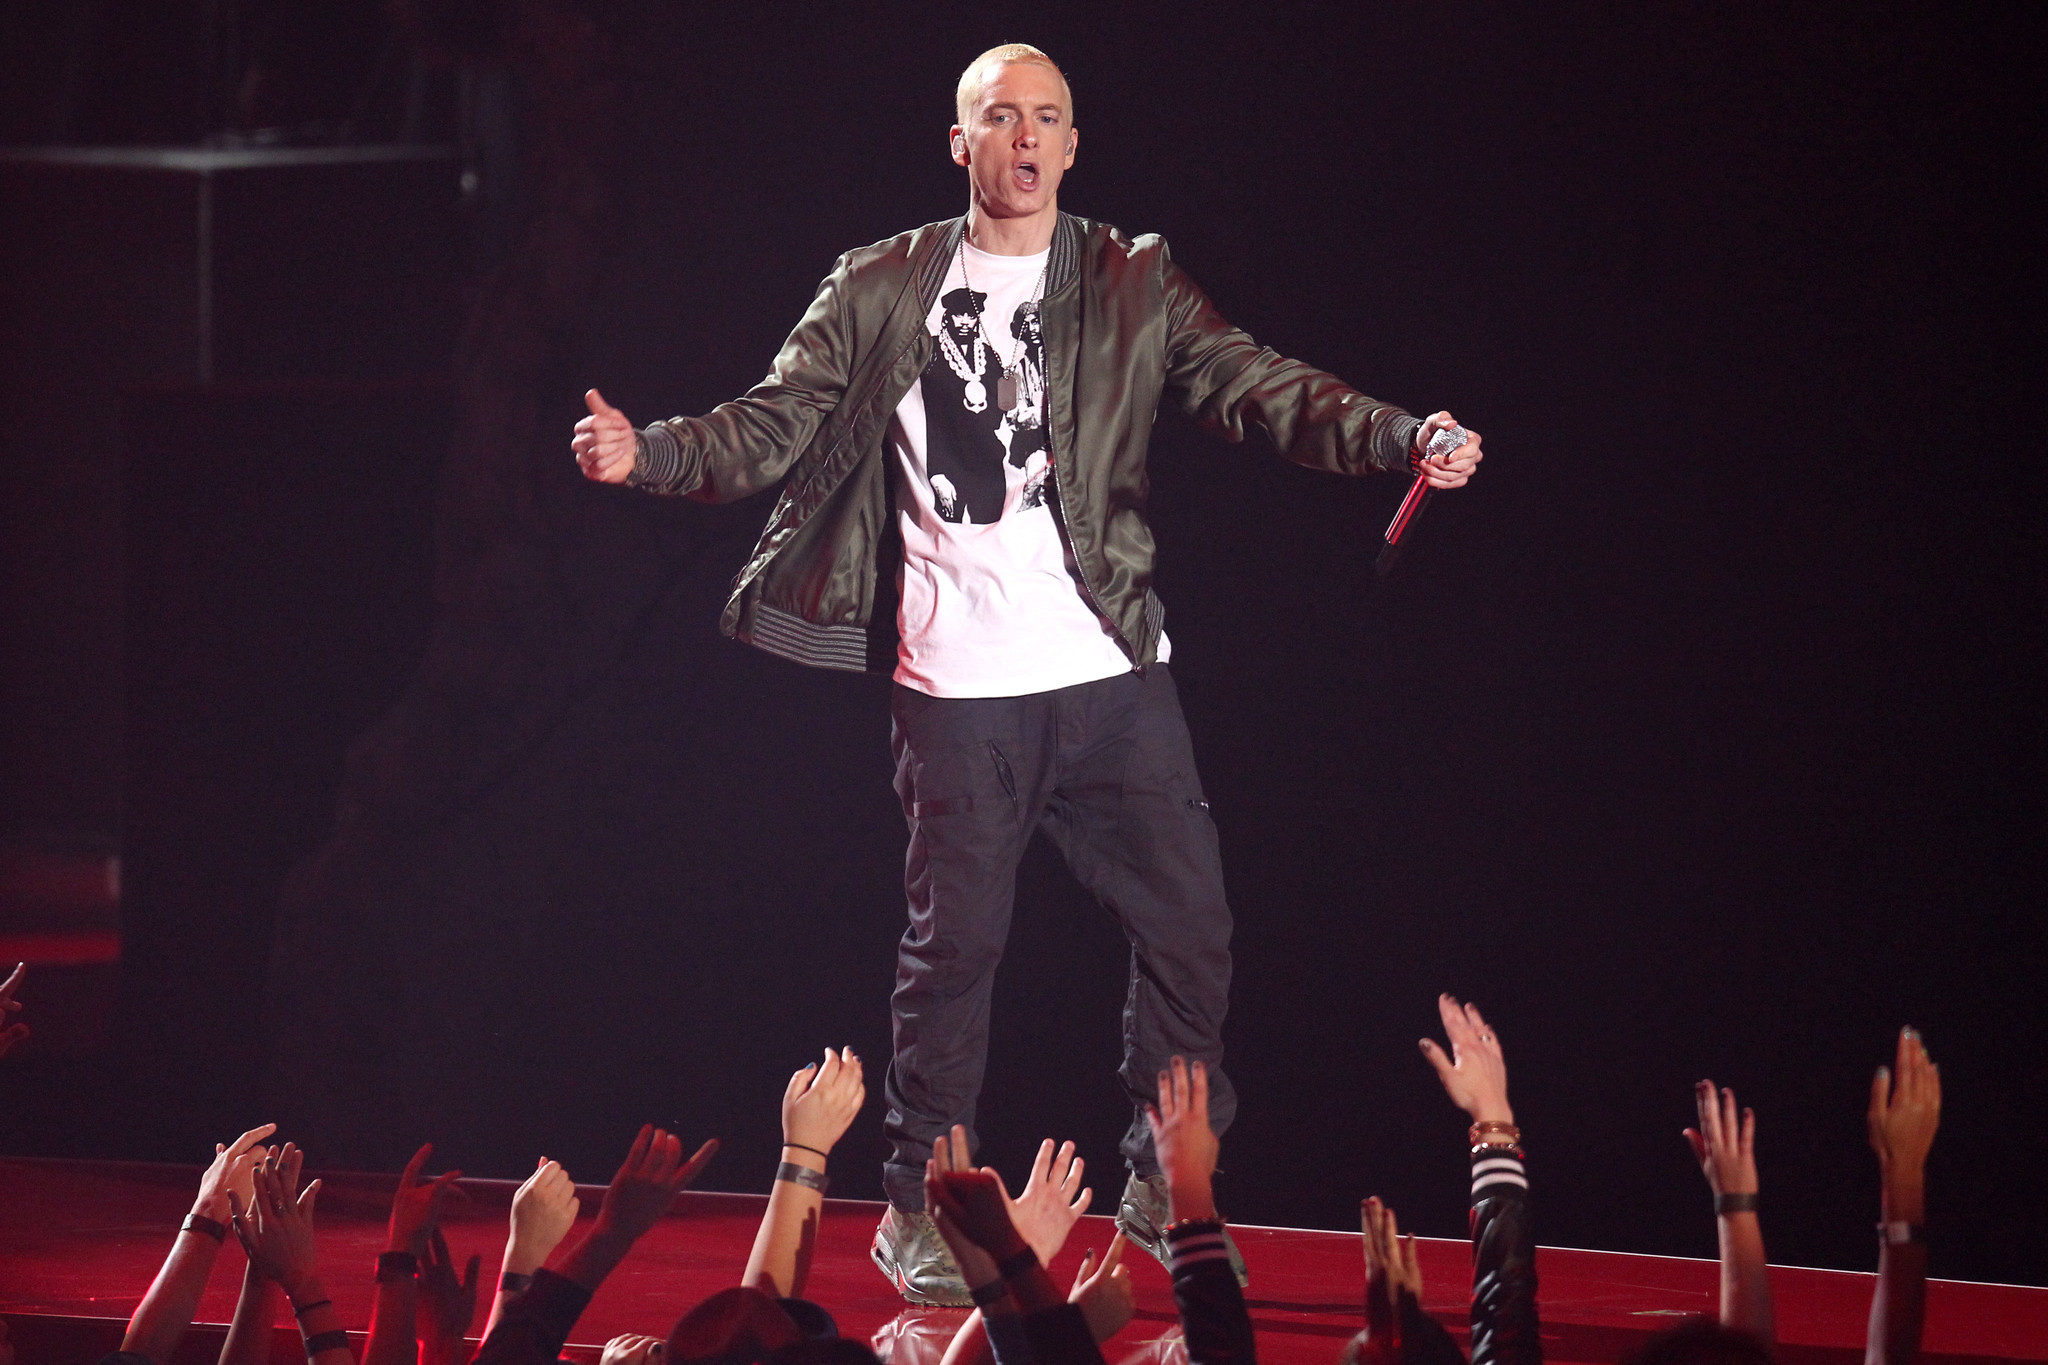 Eminem slammed for referencing Ariana Grande concert bombing on new album